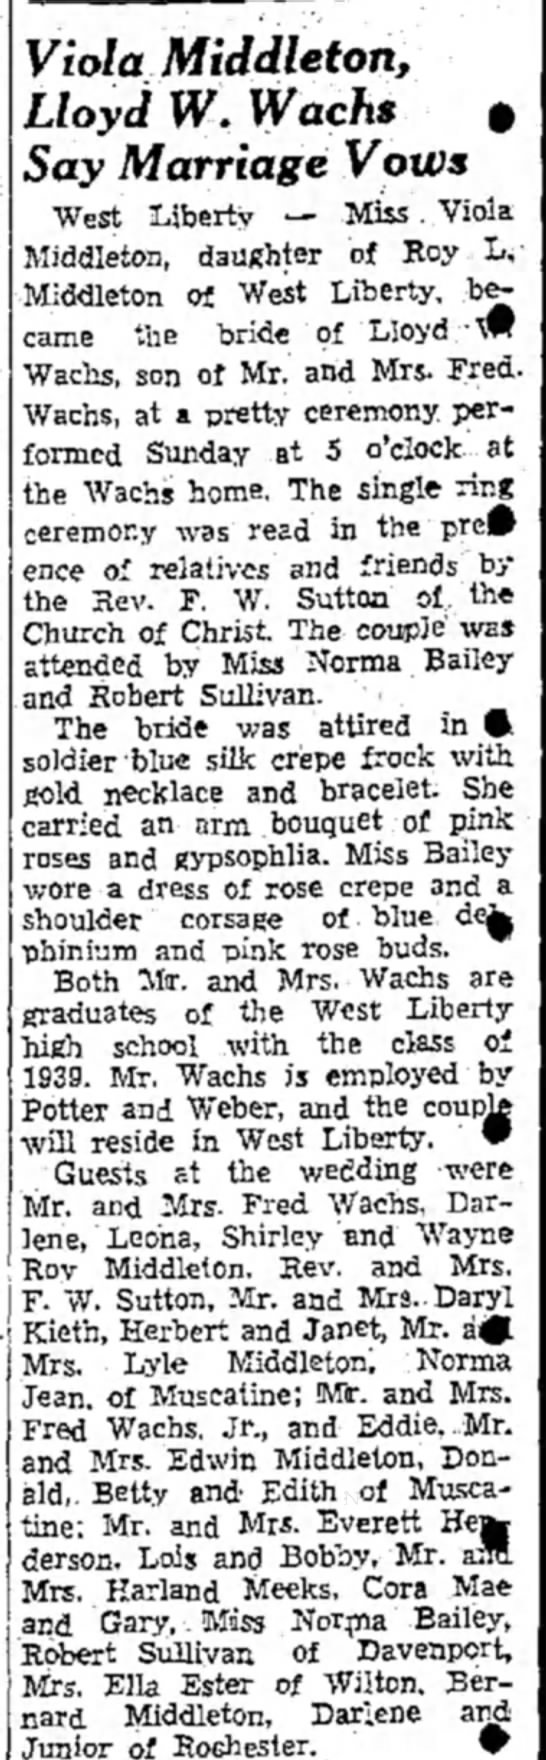 Viola Middleton /Lloyd Wachs marriage 15 Sept 1940 -